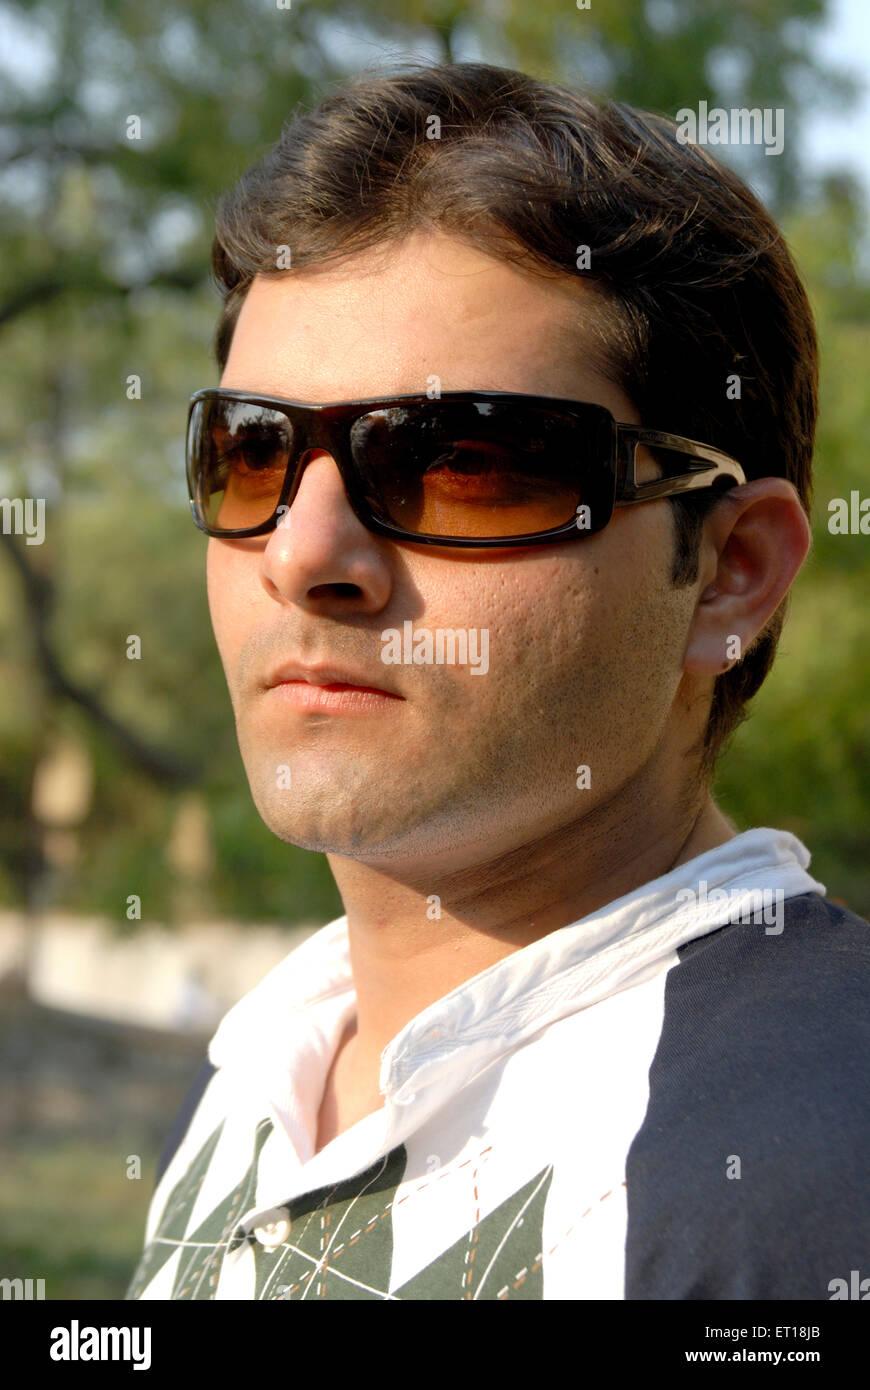 Boy in sunglass MR# 364 November 2008 - Stock Image